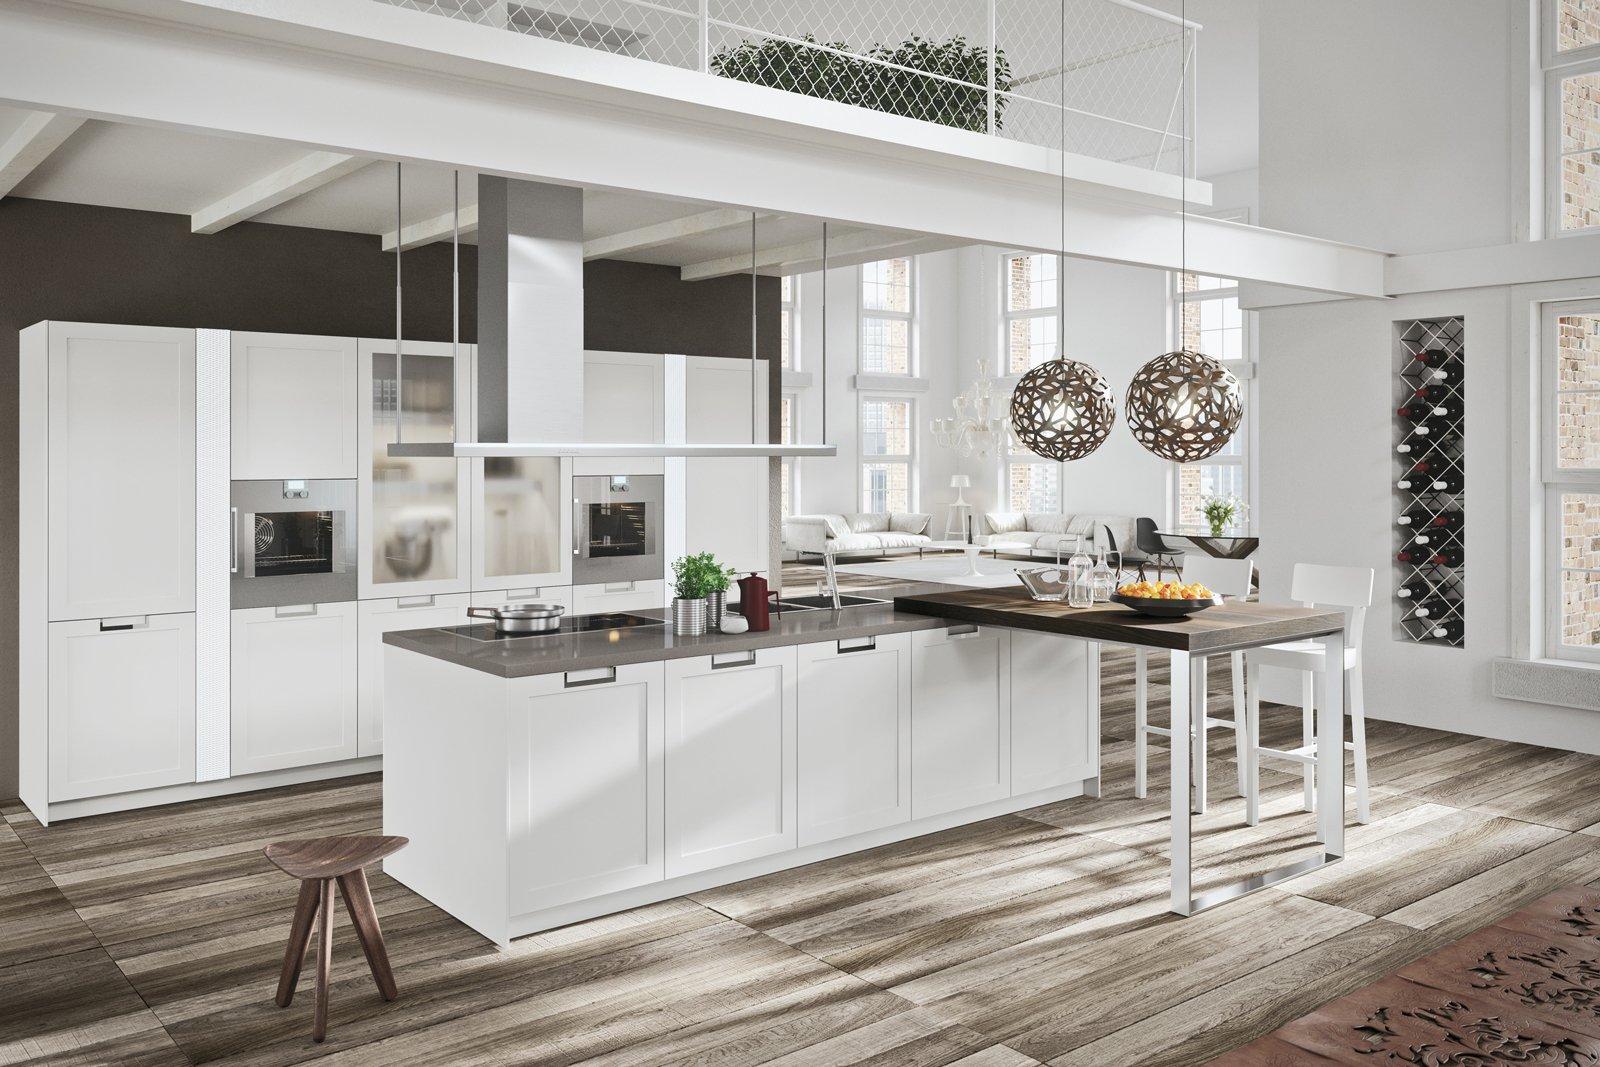 cucine country chic: soprattutto bianche o tinta legno - cose di casa - Cucine Country Bianche